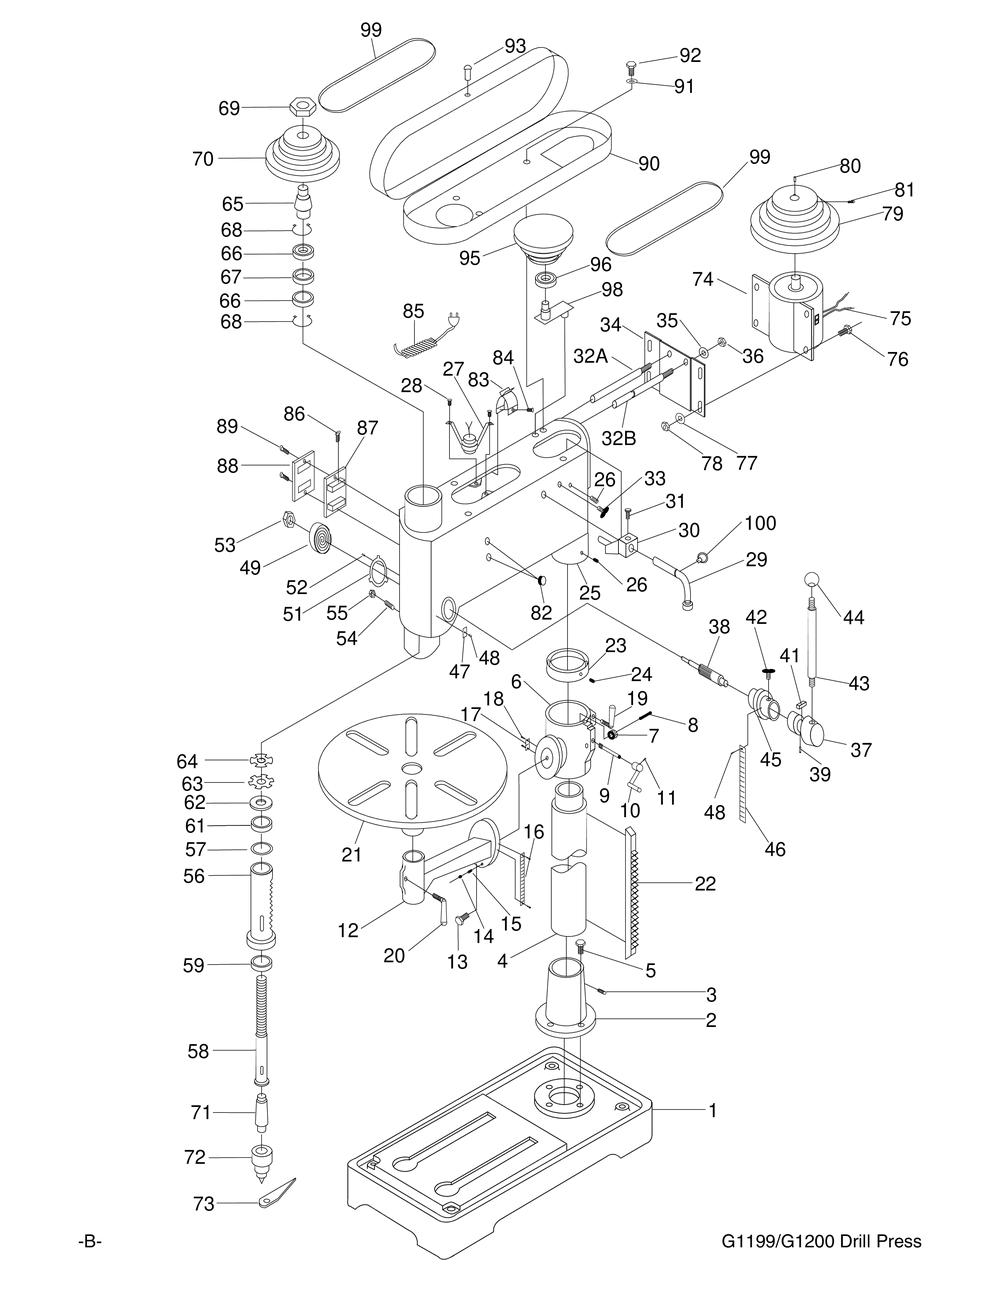 medium resolution of acdelco 27si alternator wiring diagram acdelco 3 wire gm 4 wire gm alternator wiring delco alternator wiring diagram